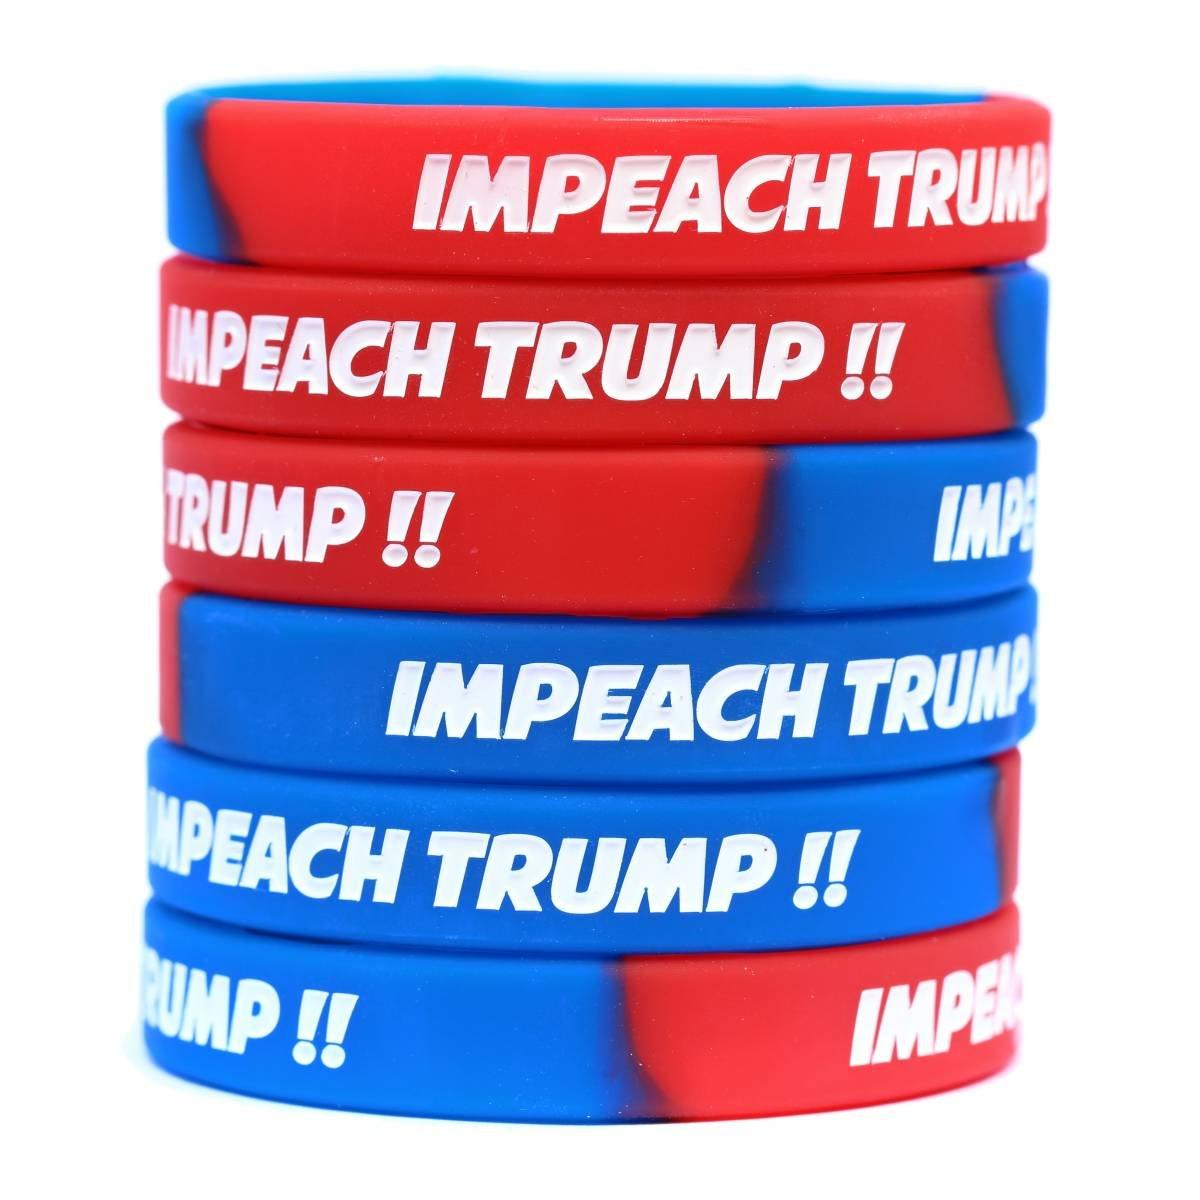 Impeach Trumpリストバンドセット(に1から100バンド) 20大人(20 Adult)  B06XGL5XBS